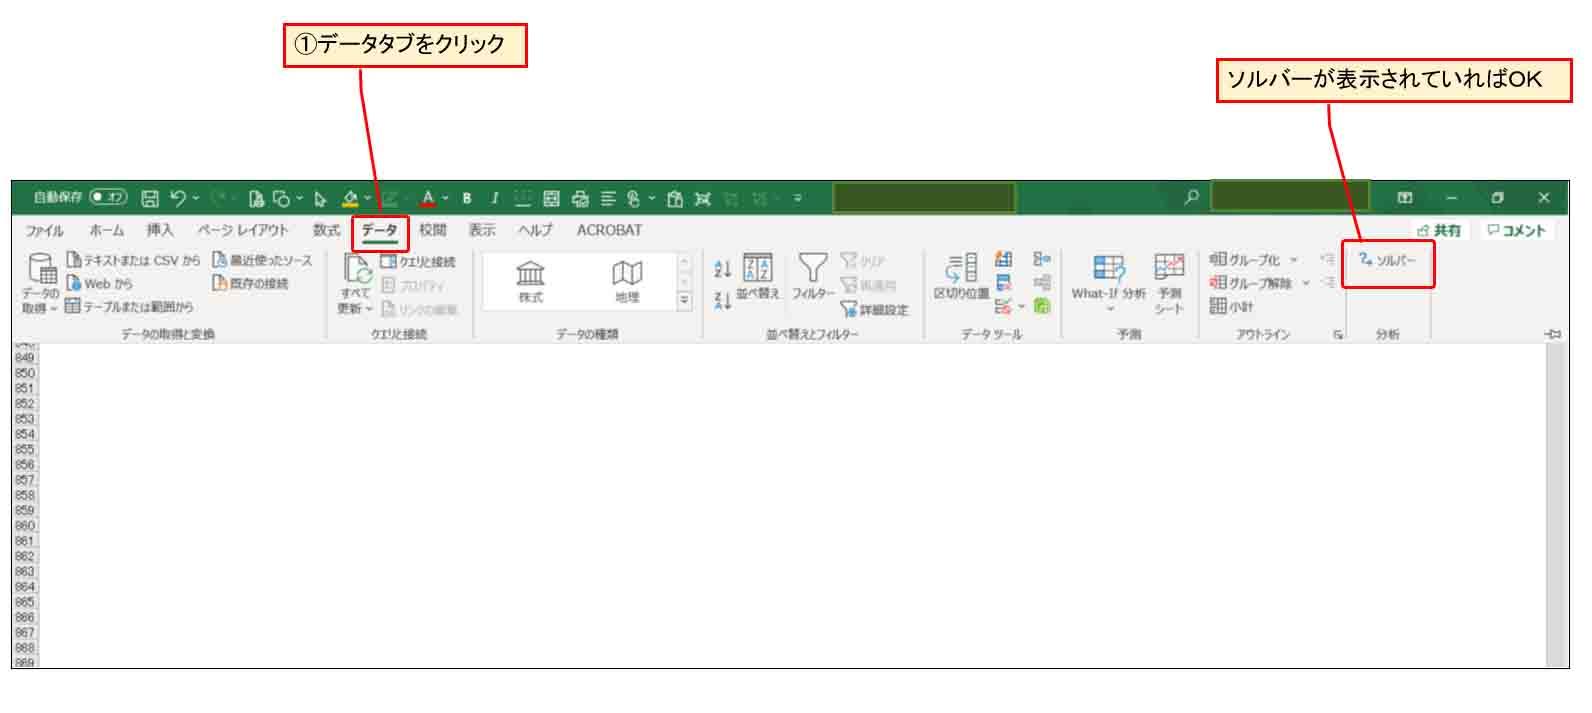 neural_network3_05.jpg